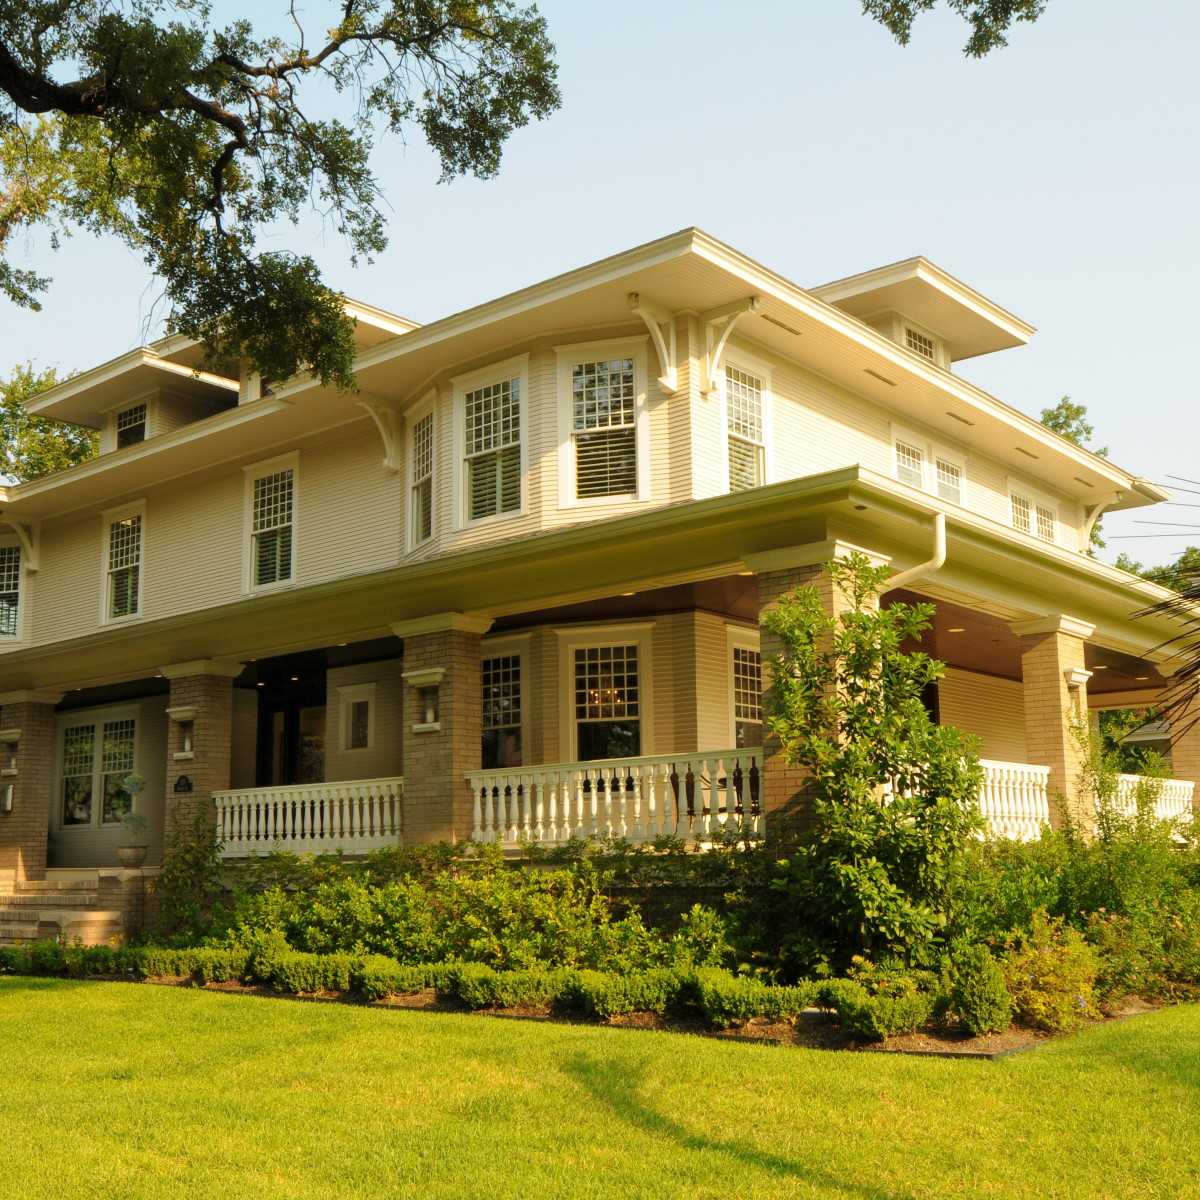 News, Shelby, Heritage Society tour, Baldwin House, Aug. 2015